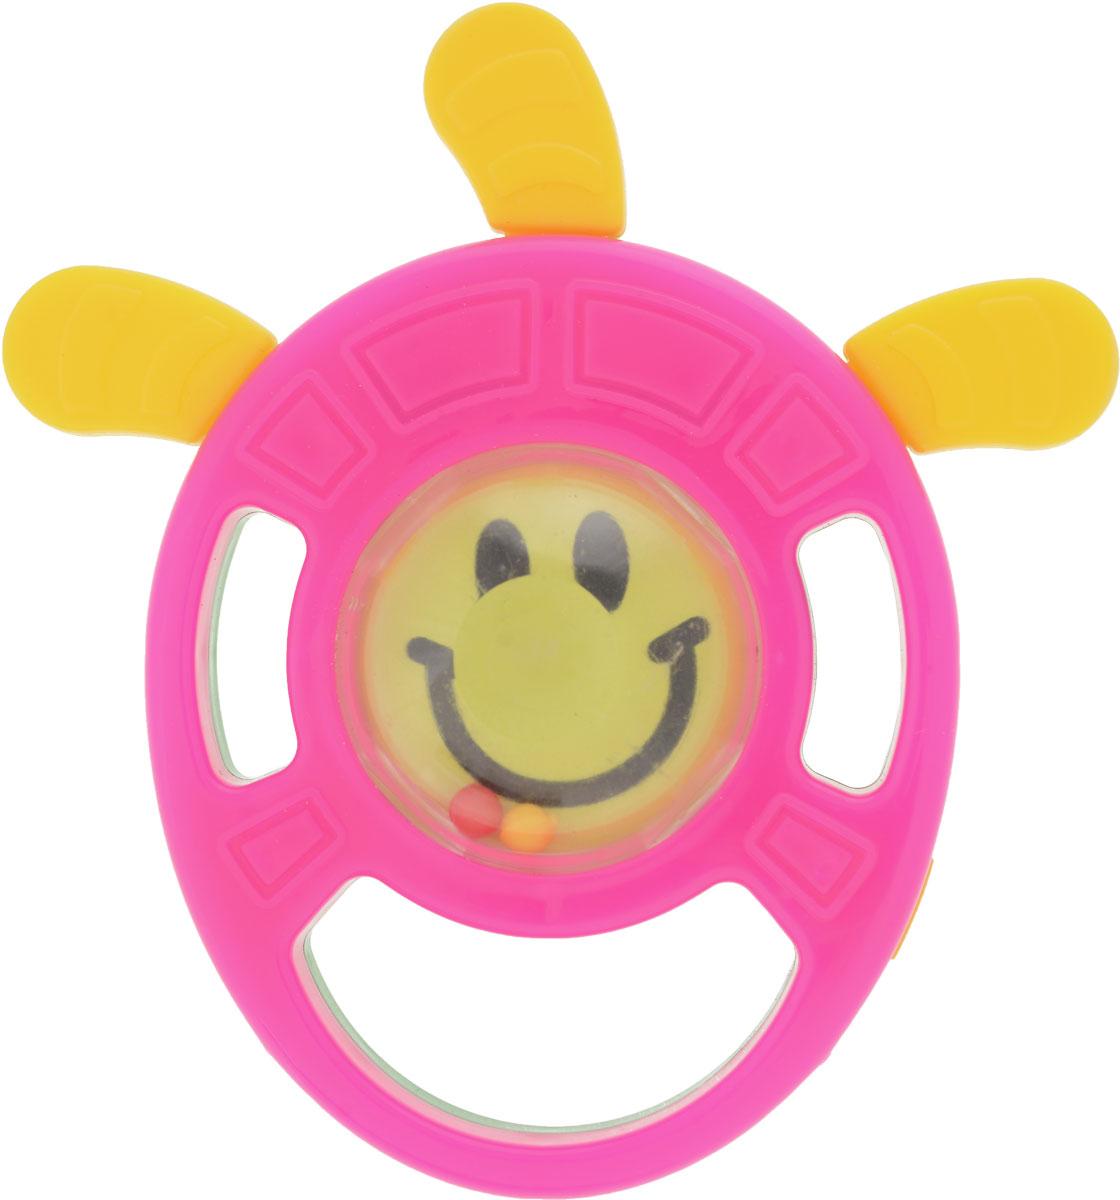 Пластмастер Погремушка-грызунок Петрушка цвет розовый